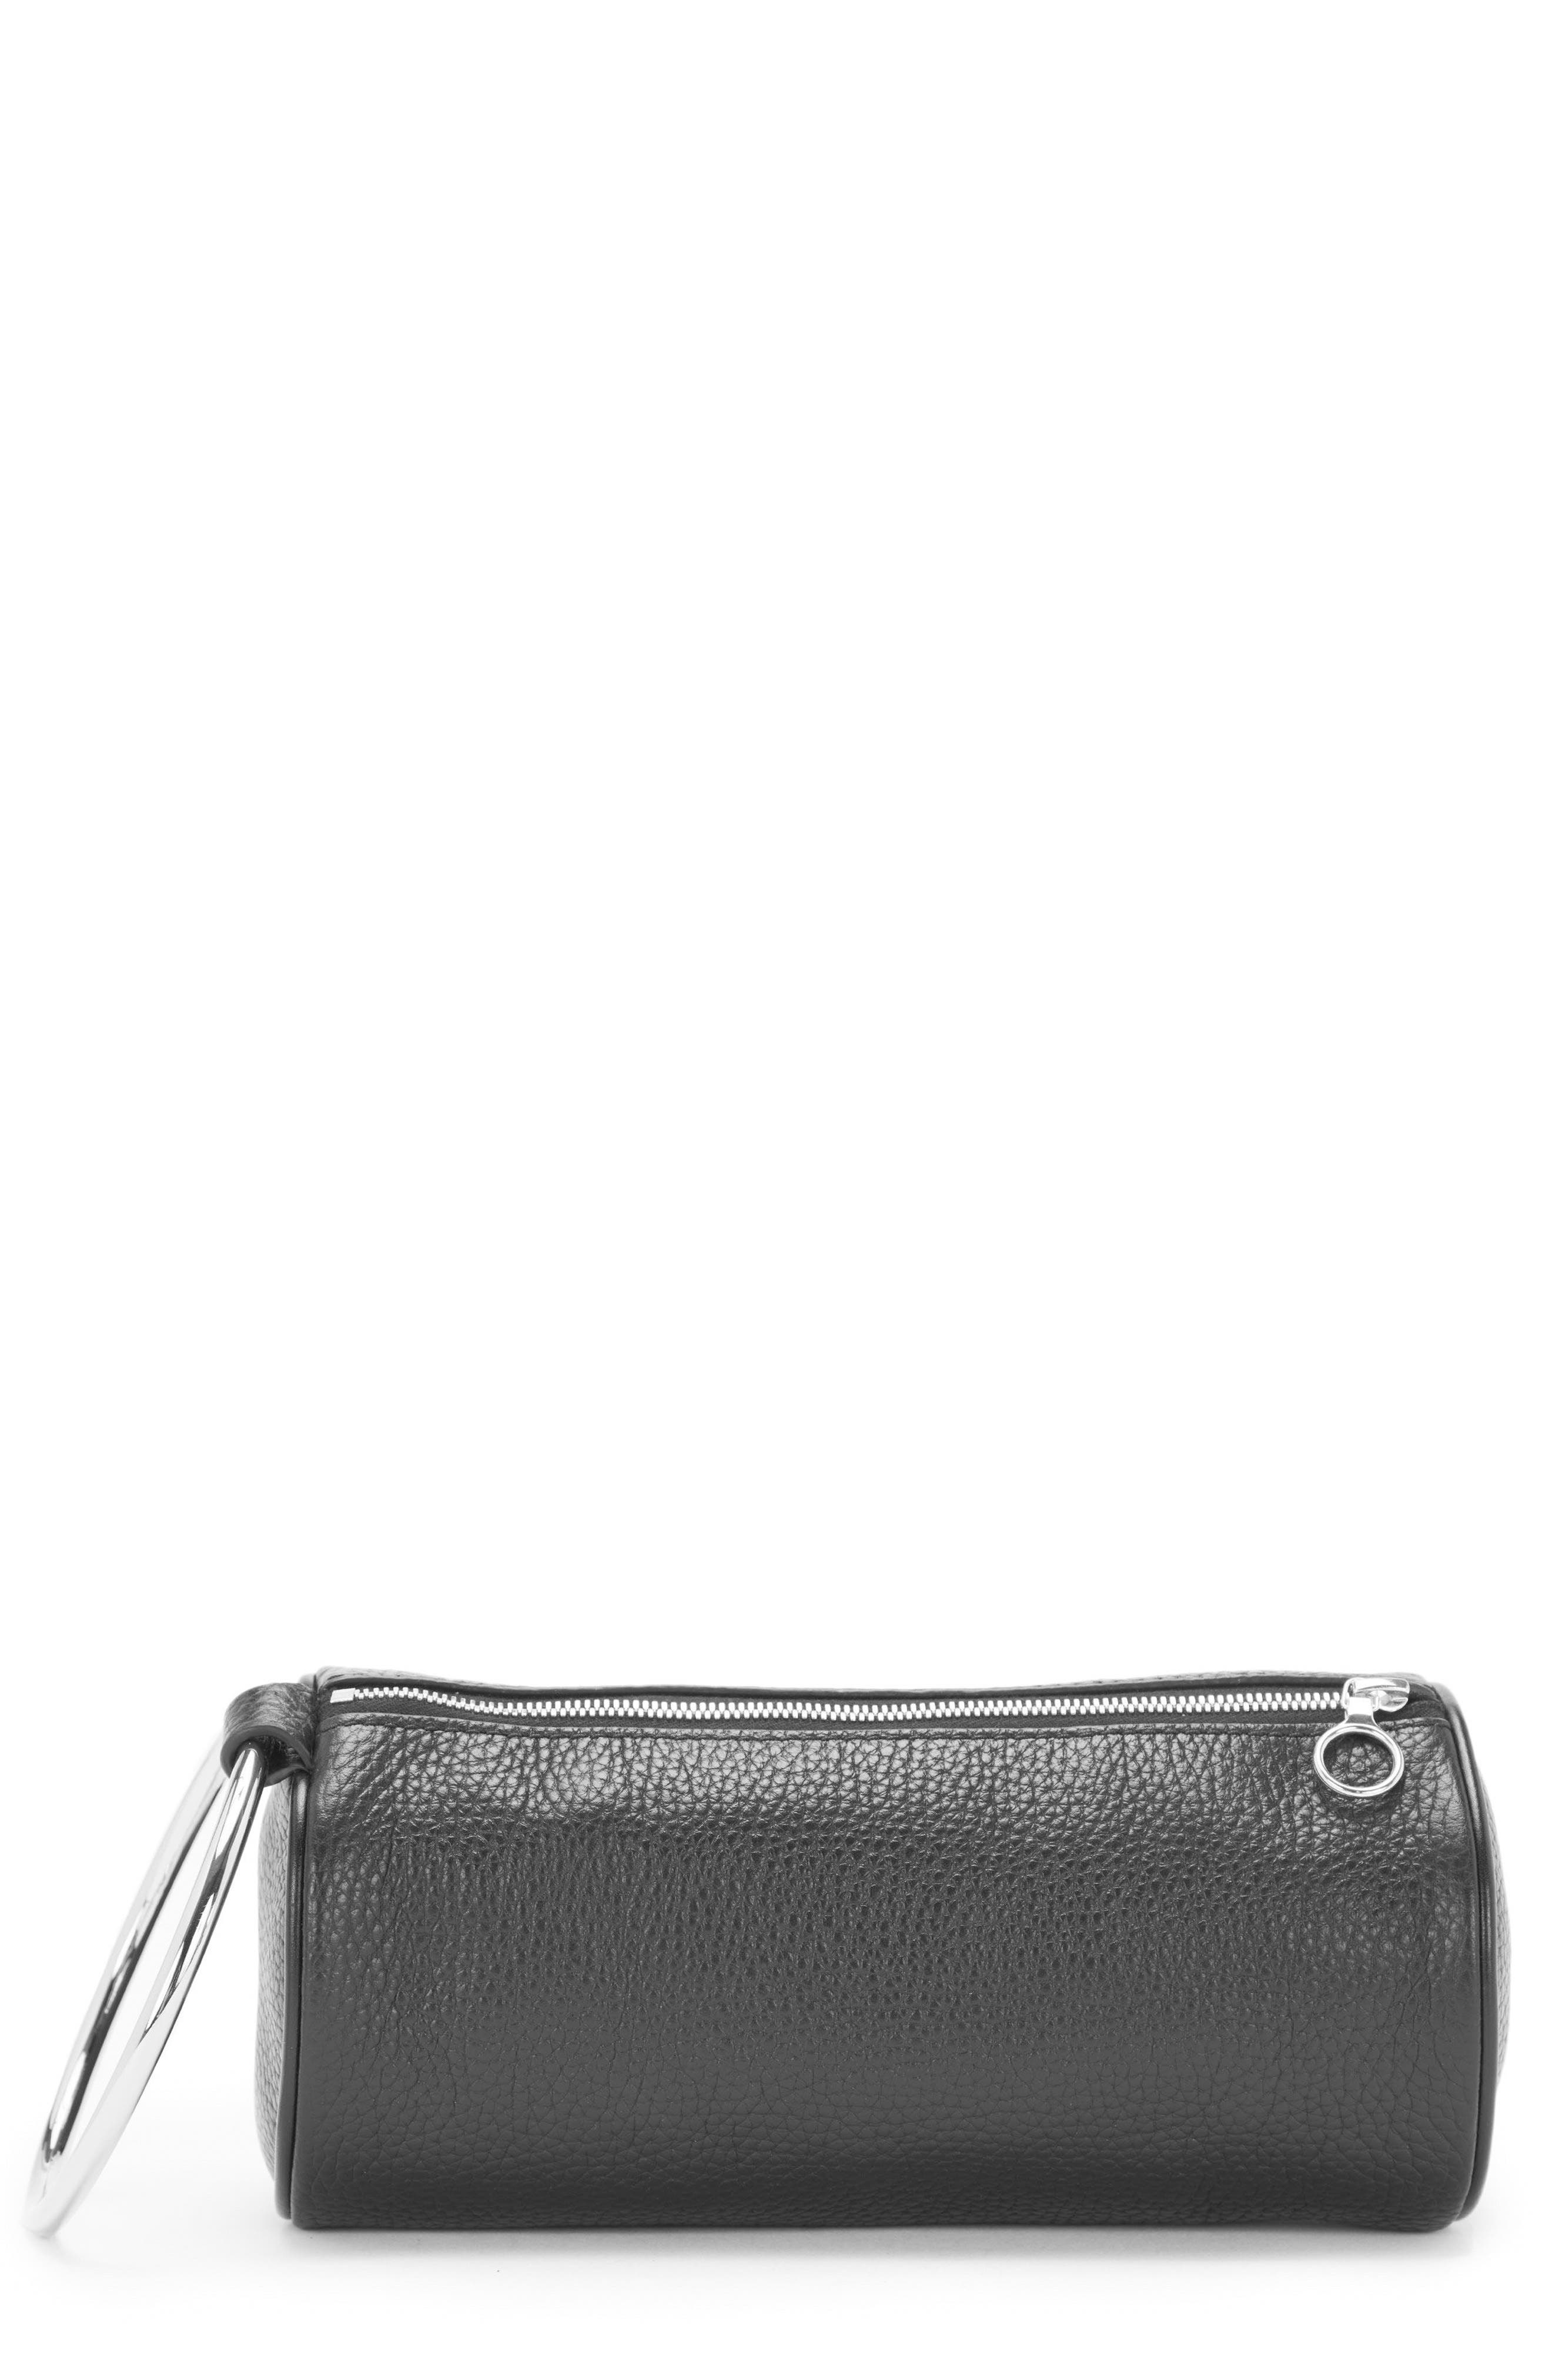 Pebbled Leather Duffel Wristlet Clutch,                             Main thumbnail 1, color,                             Black